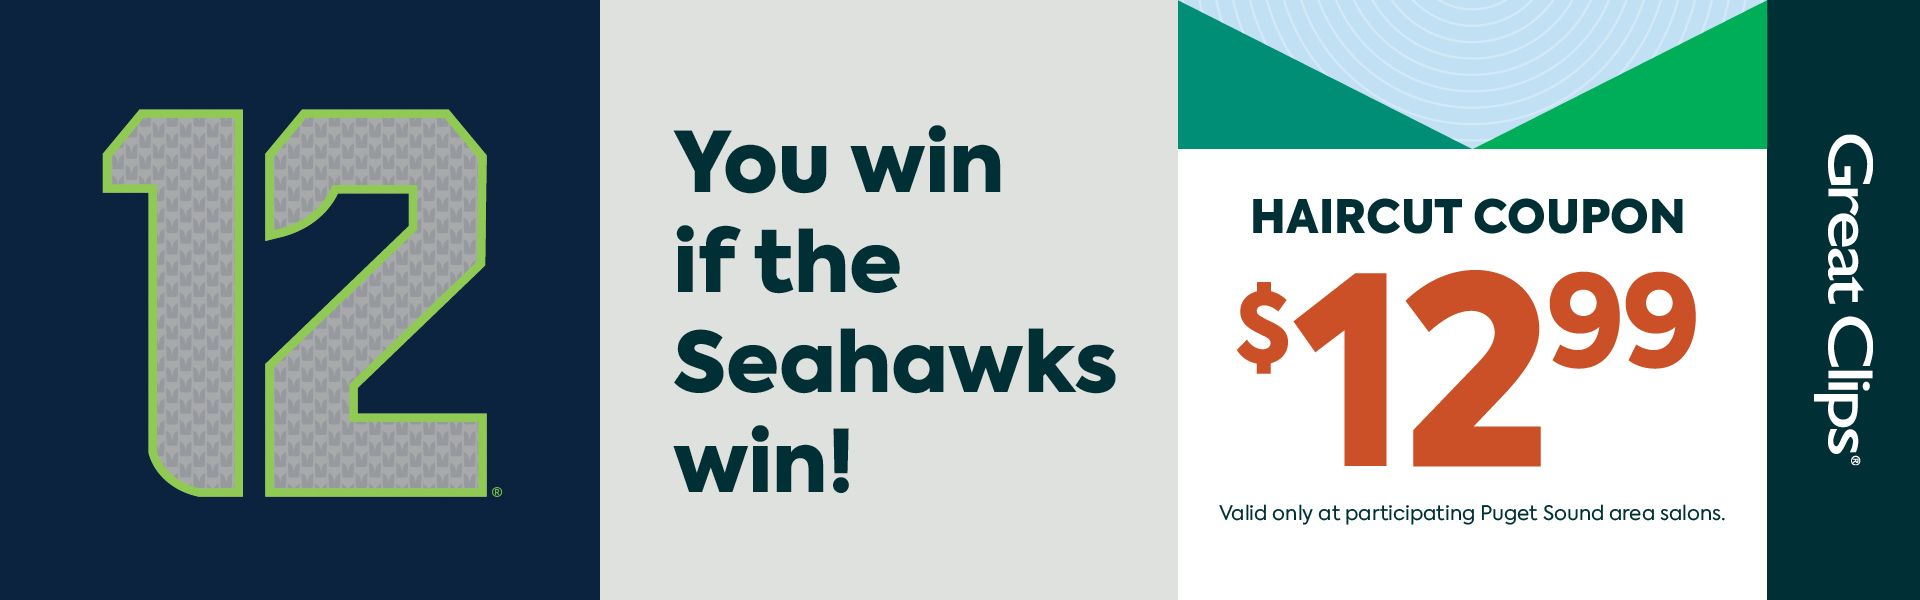 Seahawks Win = $12.99 Haircut